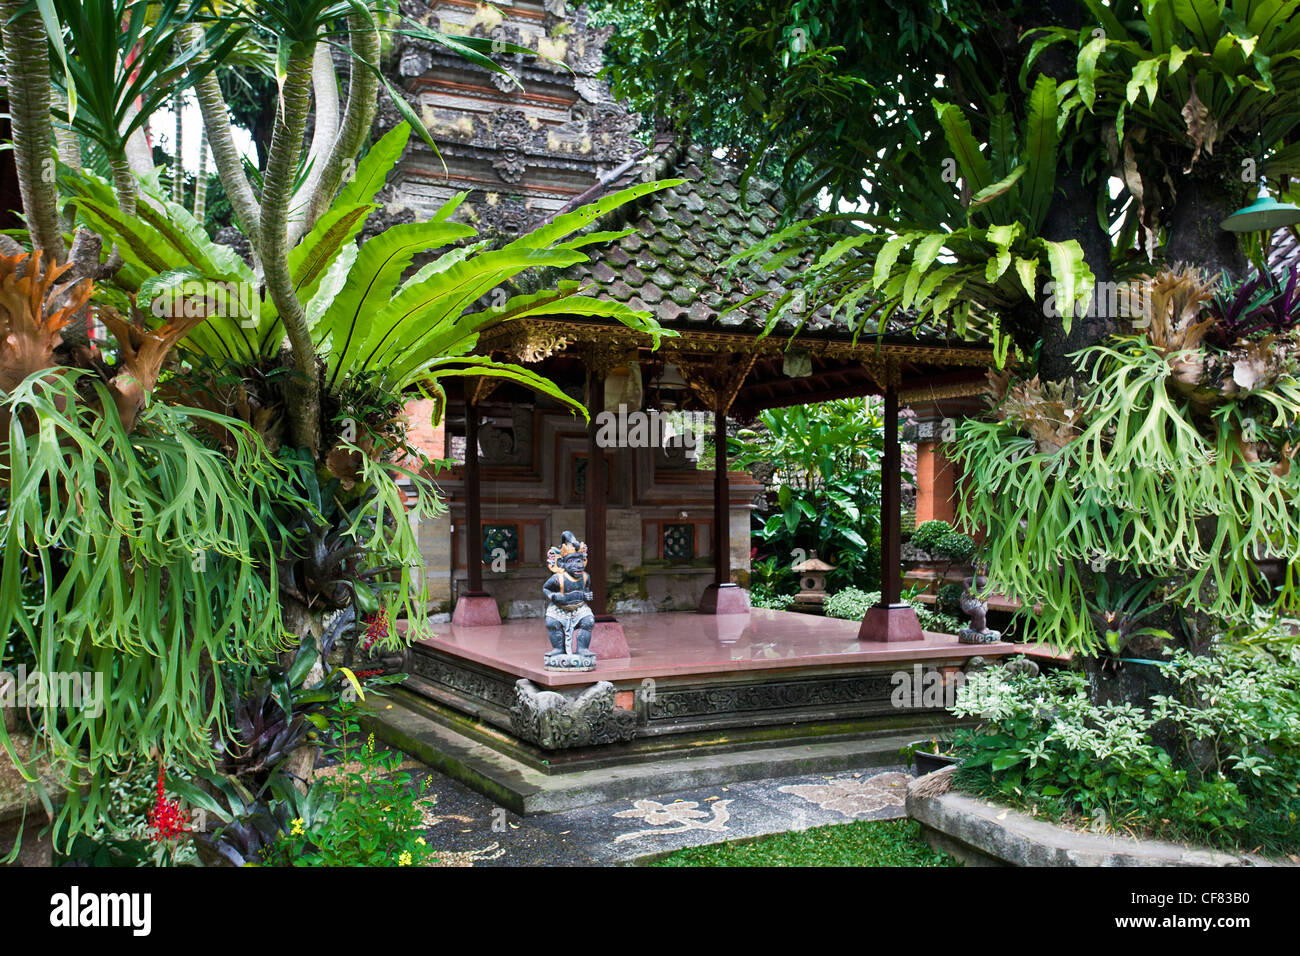 Indonesia asia bali island ubud balinese garden for Bali garden designs